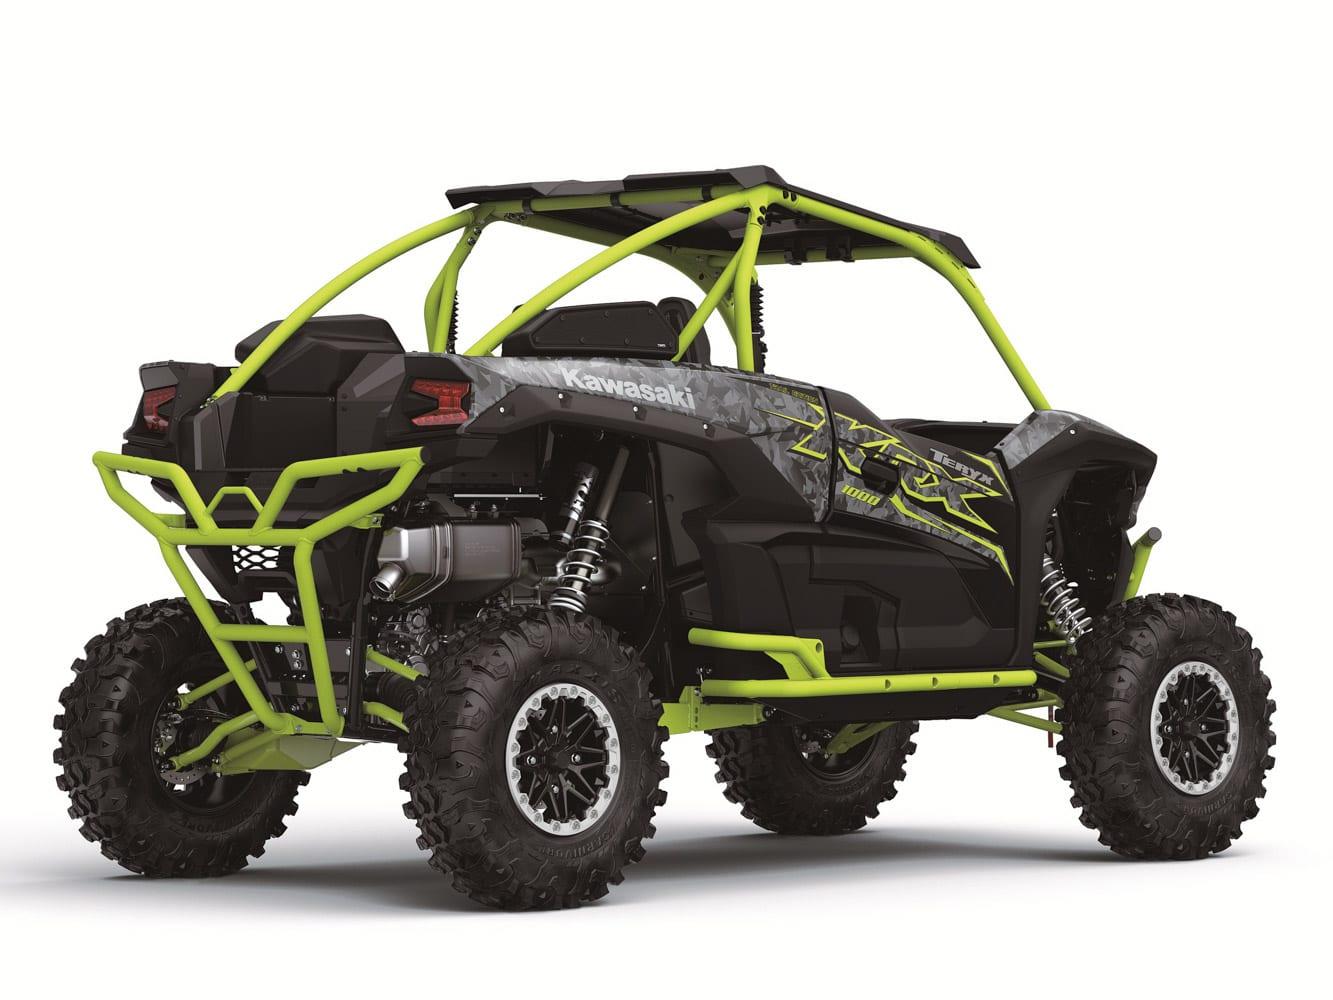 Teryx KRX® 1000 Special Edition